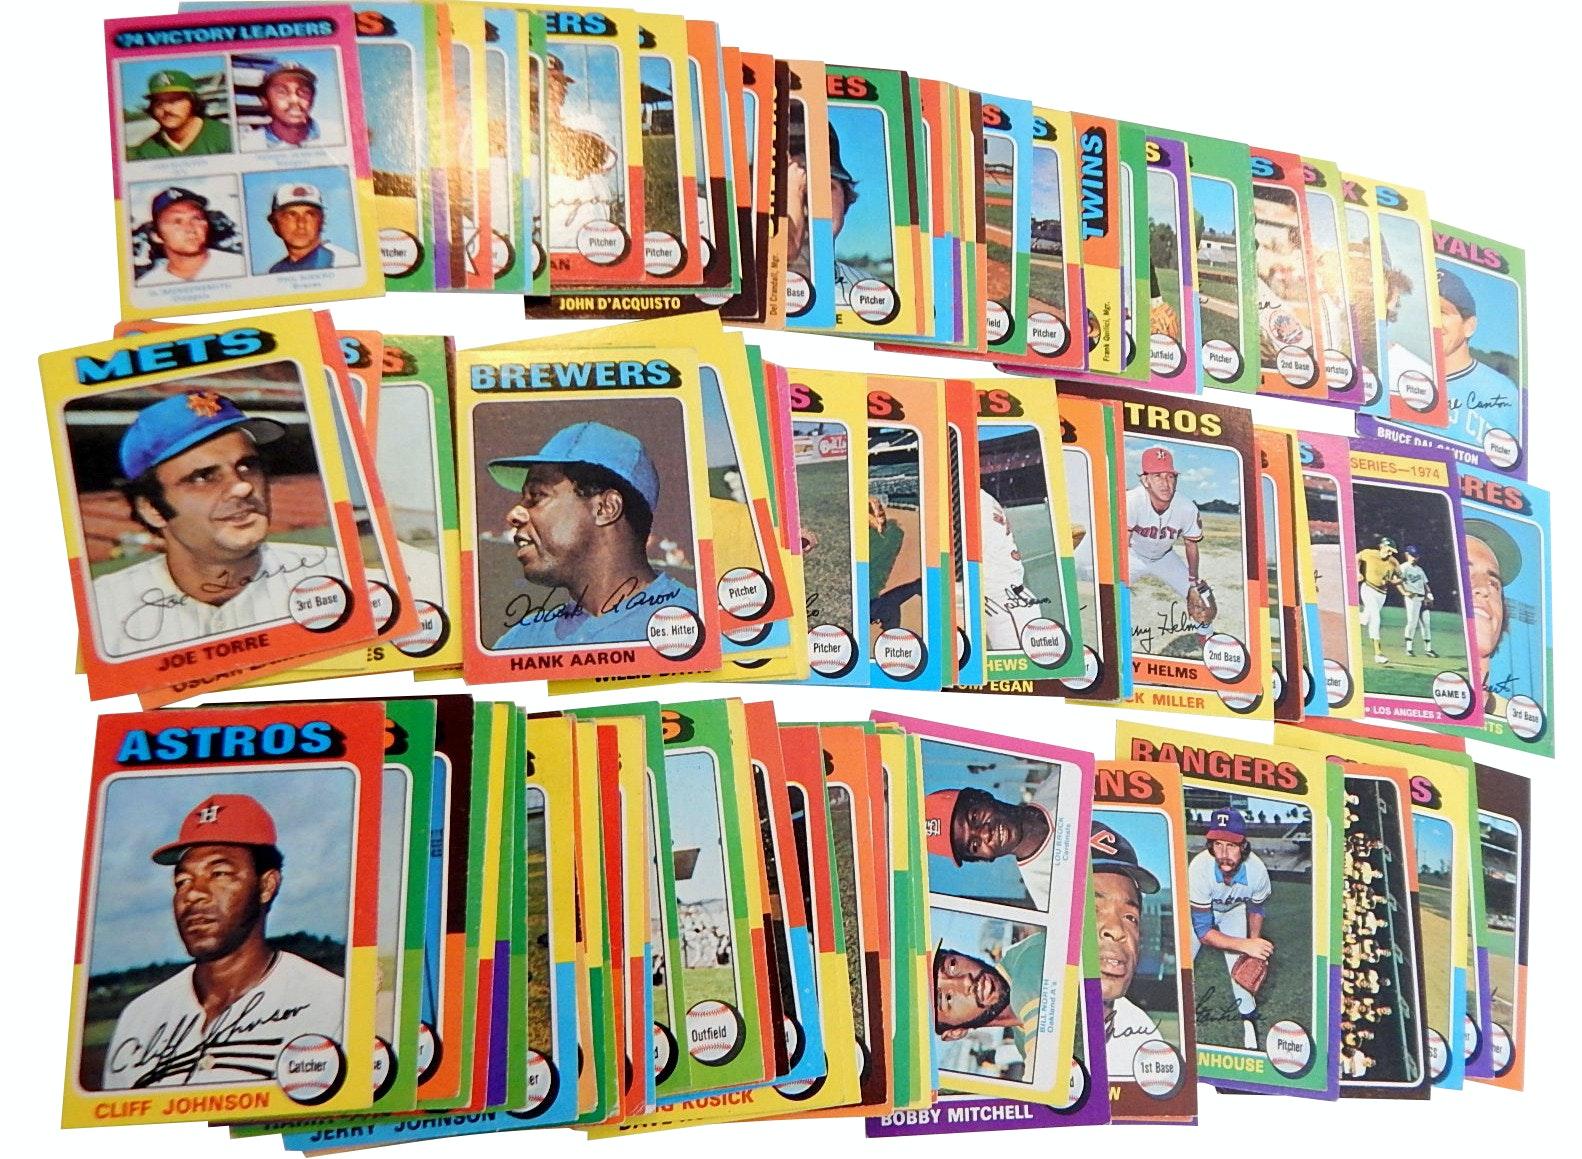 1975 Topps Baseball Mini-Cards with Hank Aaron #660, Joe Torre, Brock - 100 Ct.